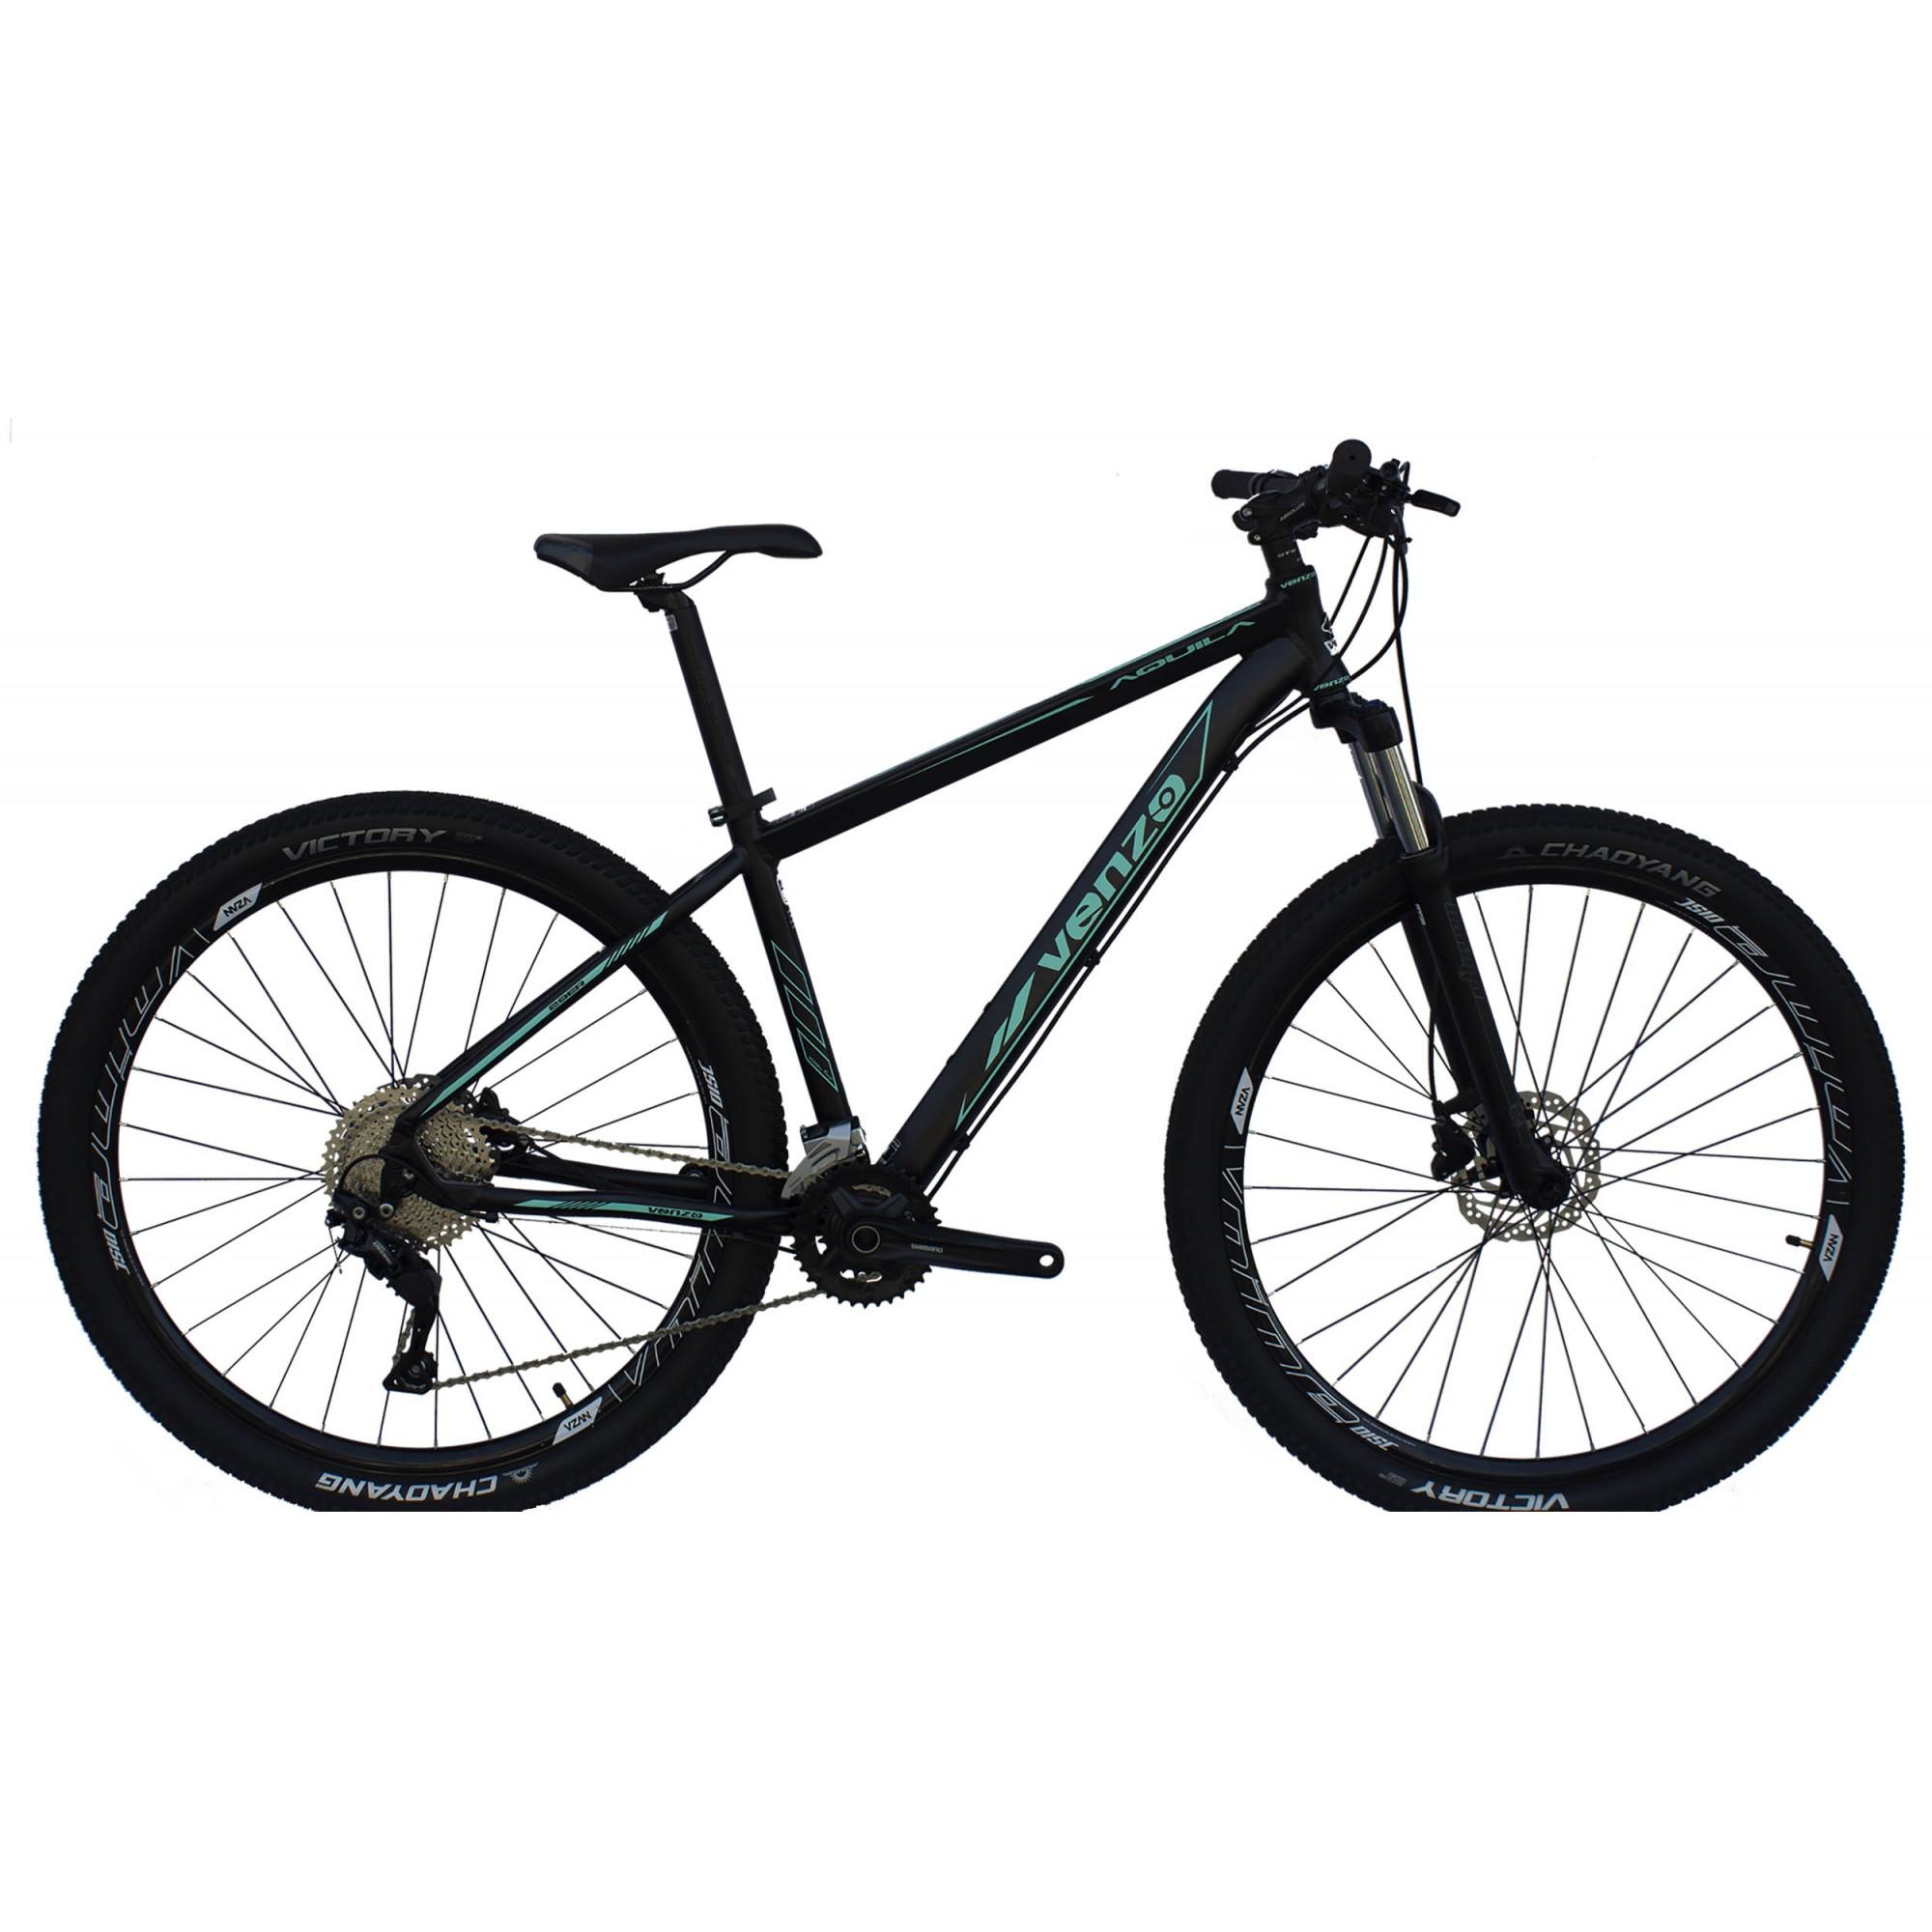 Bicicleta Aro 29 Aquila Venzo 20v Freio Hidraulico Trava Ombro